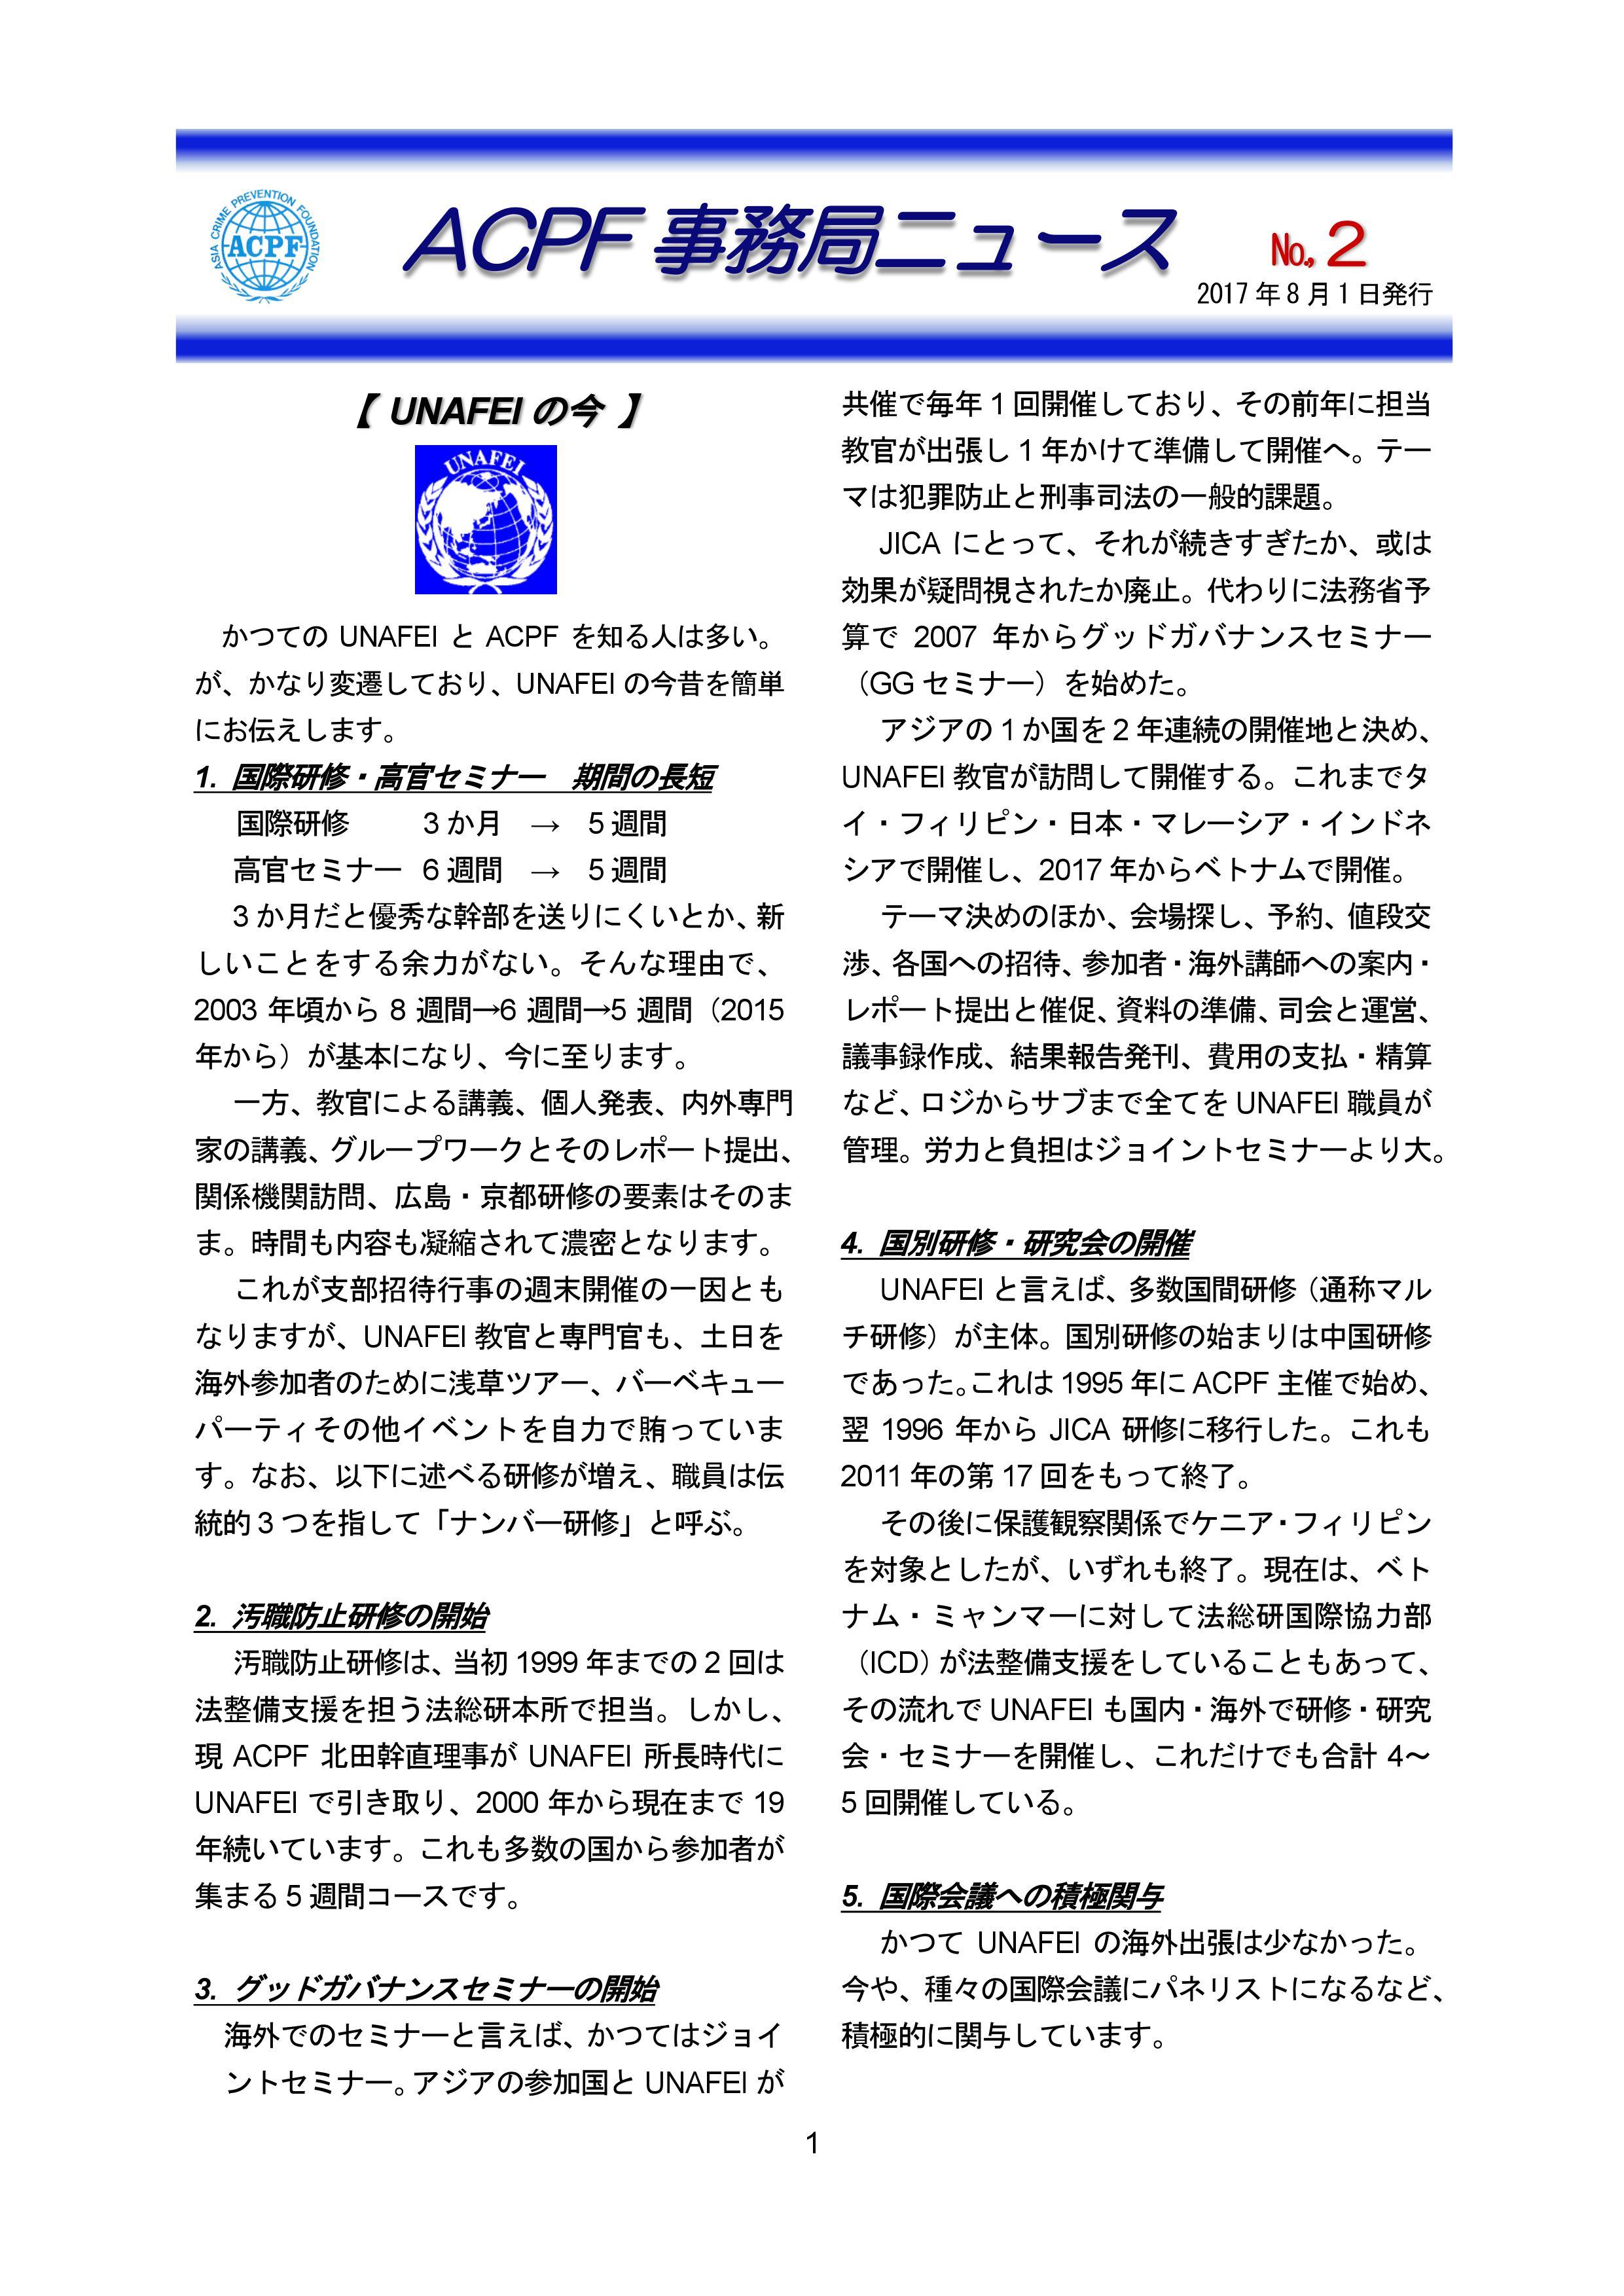 ACPF NEWS No.2